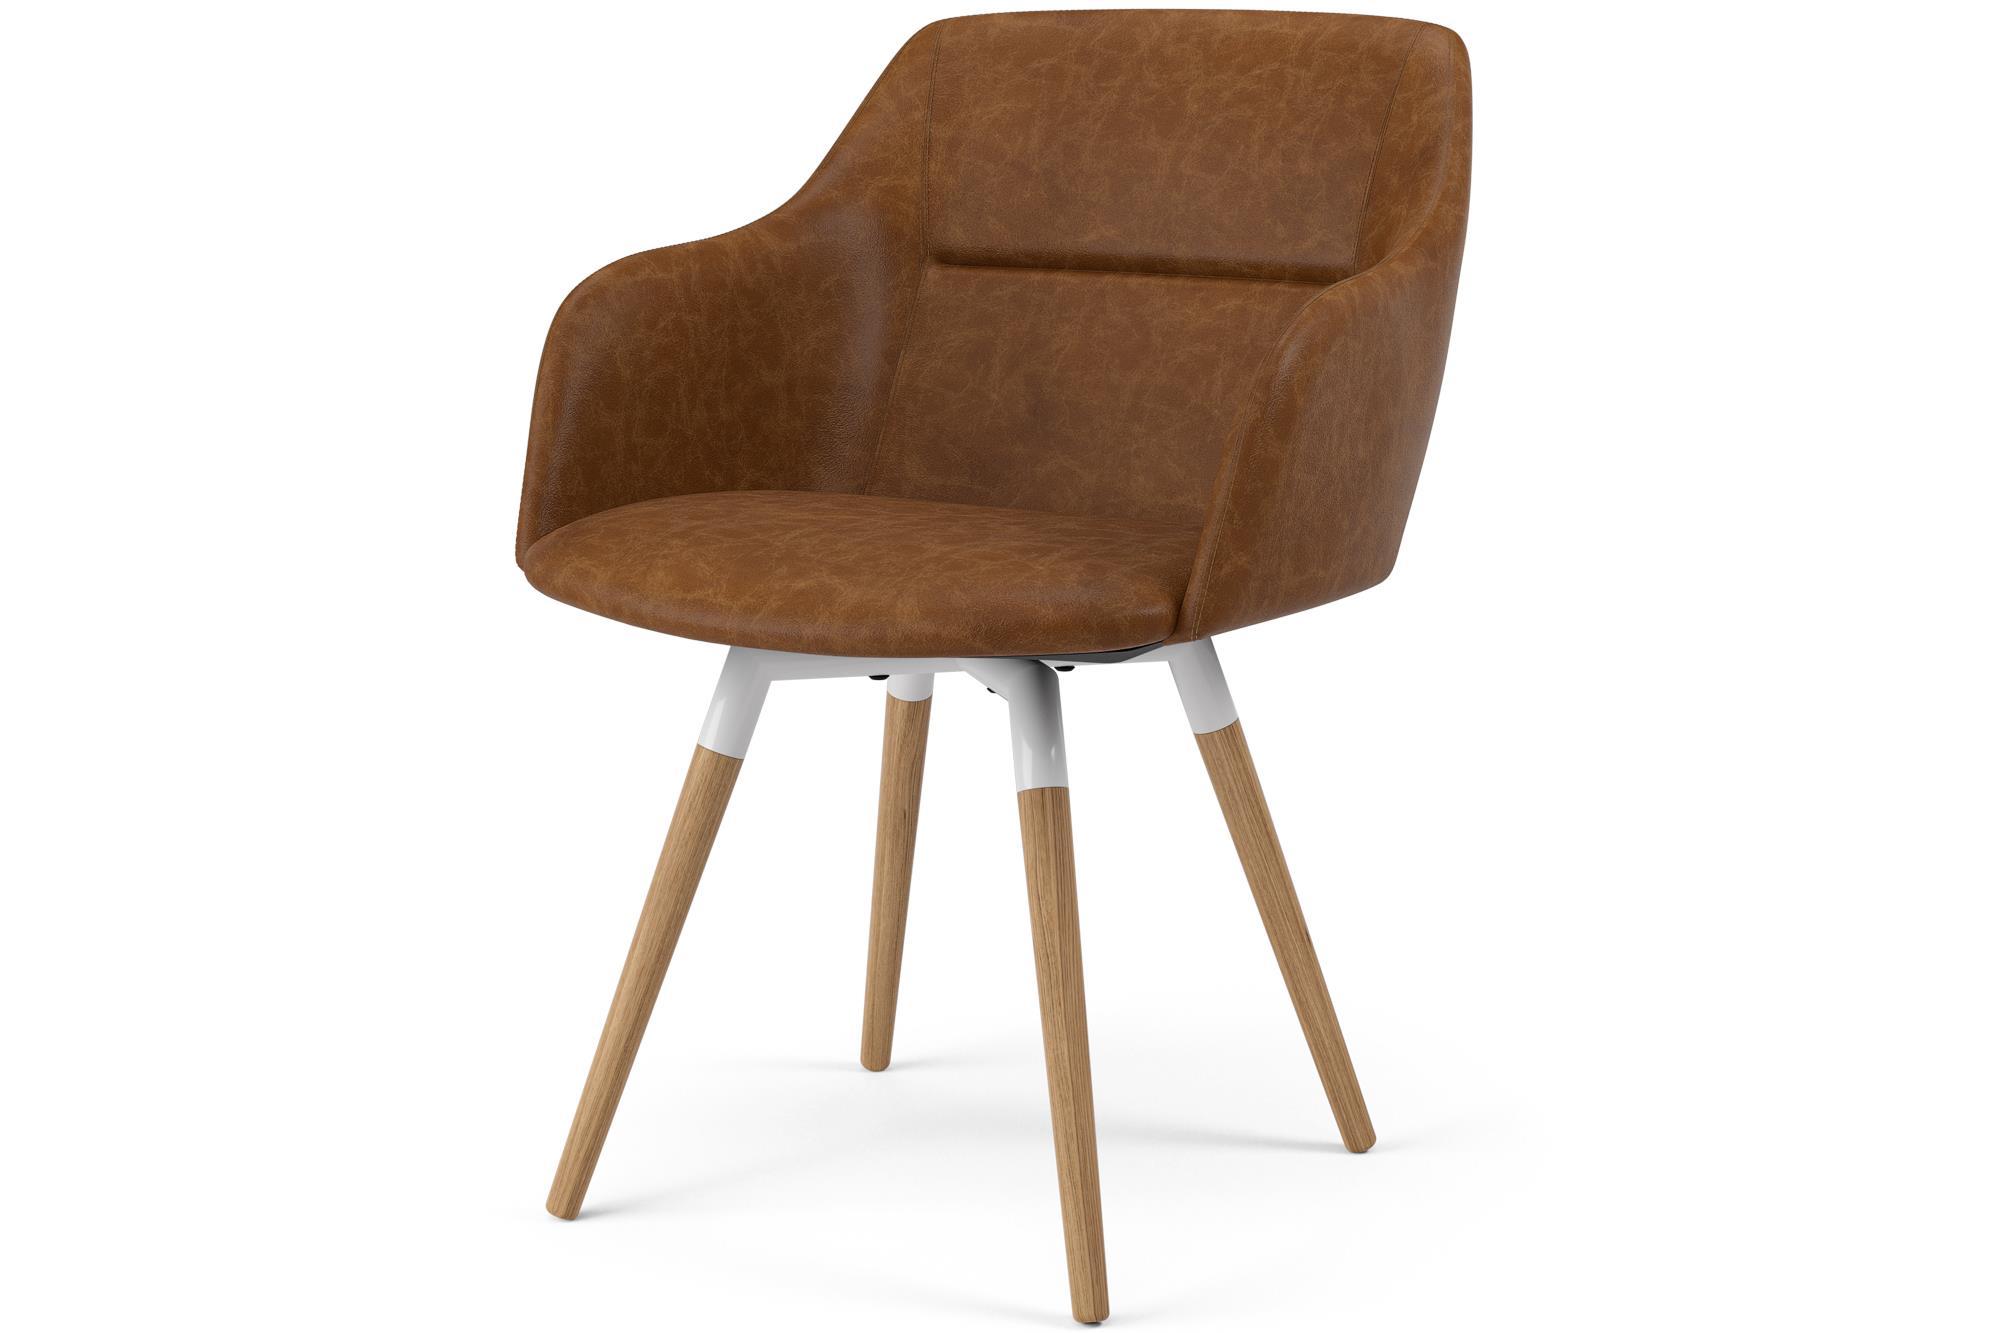 Tenzo 2x Stuhl Fido Mit Sofia Mit Kunstleder